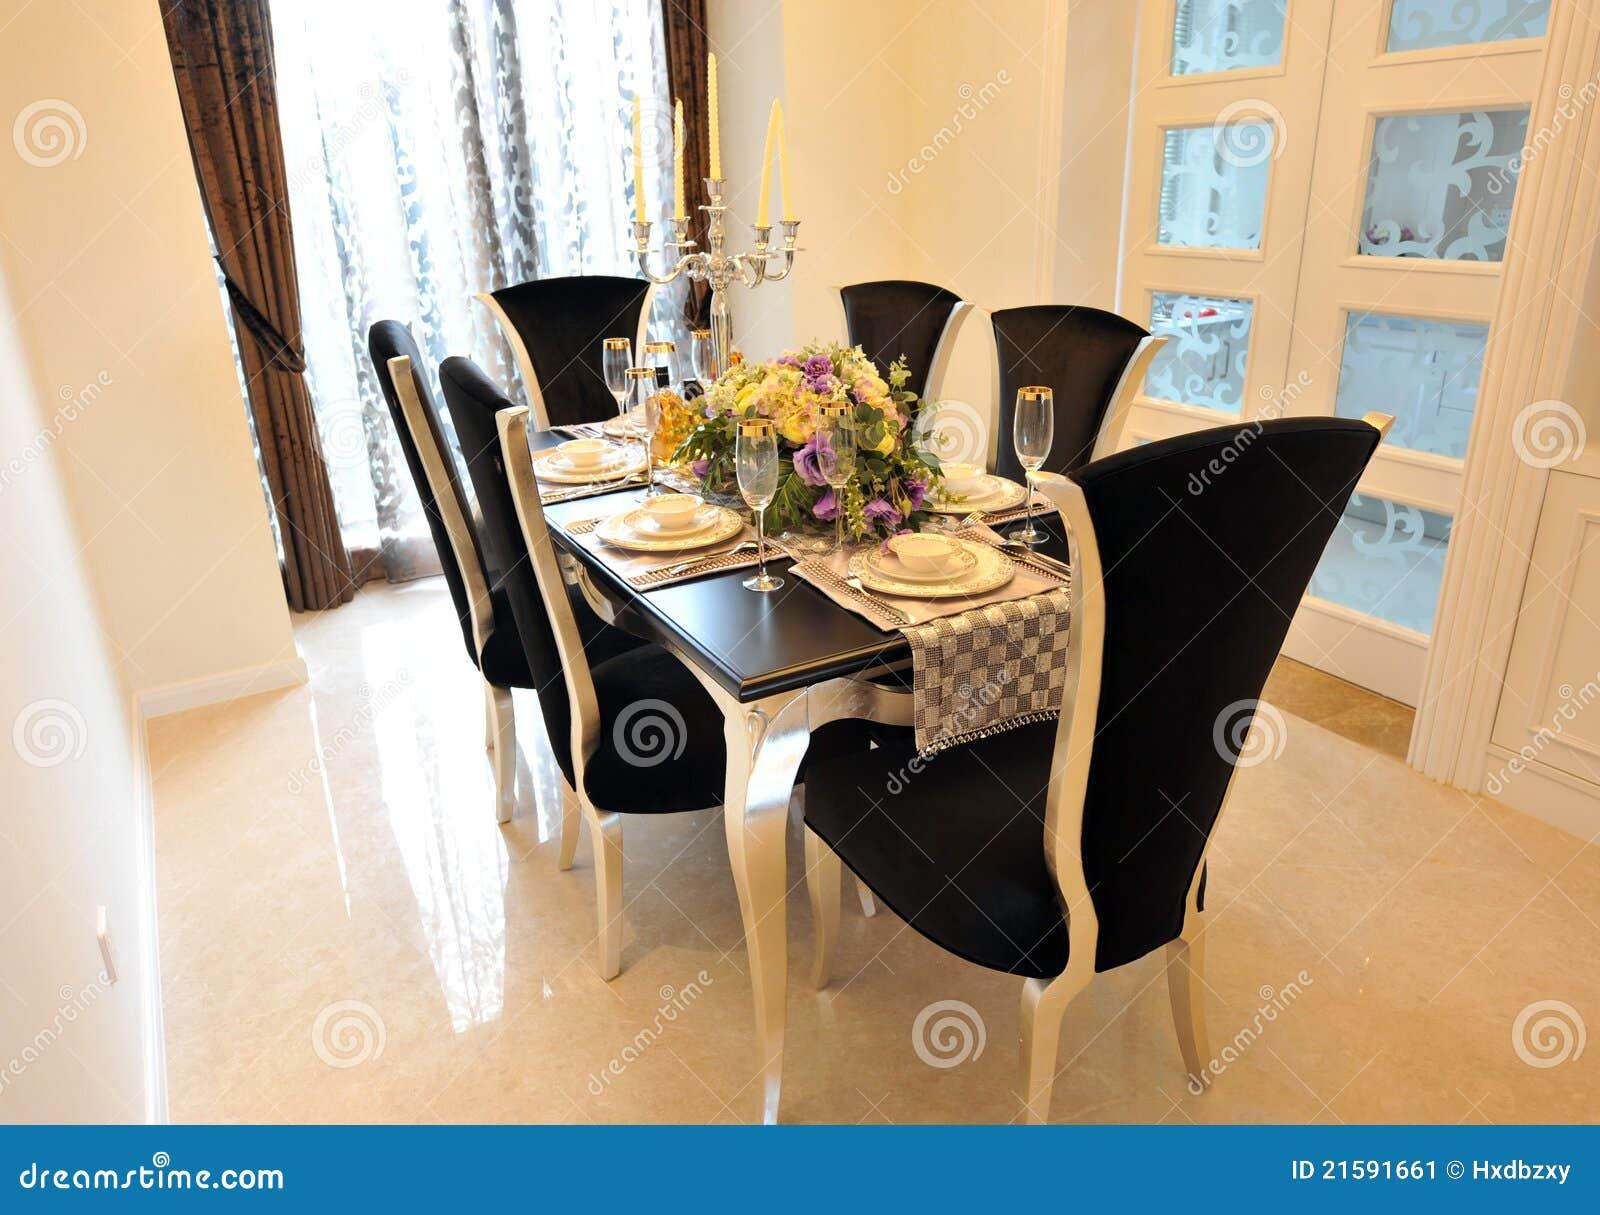 Sala Da Pranzo Di Lusso Immagine Stock Immagine: 21591661 #A36C28 1300 1004 Sala Da Pranzo Luigi Xv